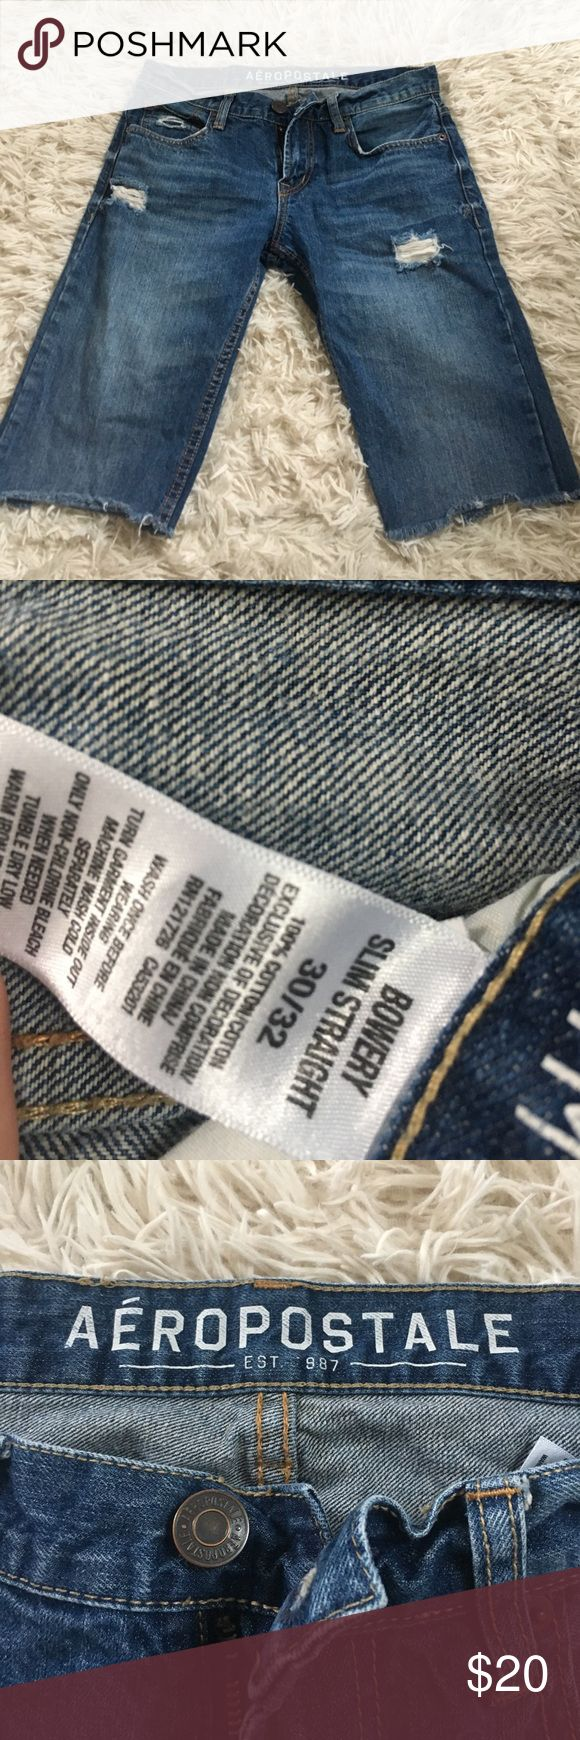 Men's Jean Cutoffs Great condition men's Jean cut offs! Aeropostale Shorts Jean Shorts